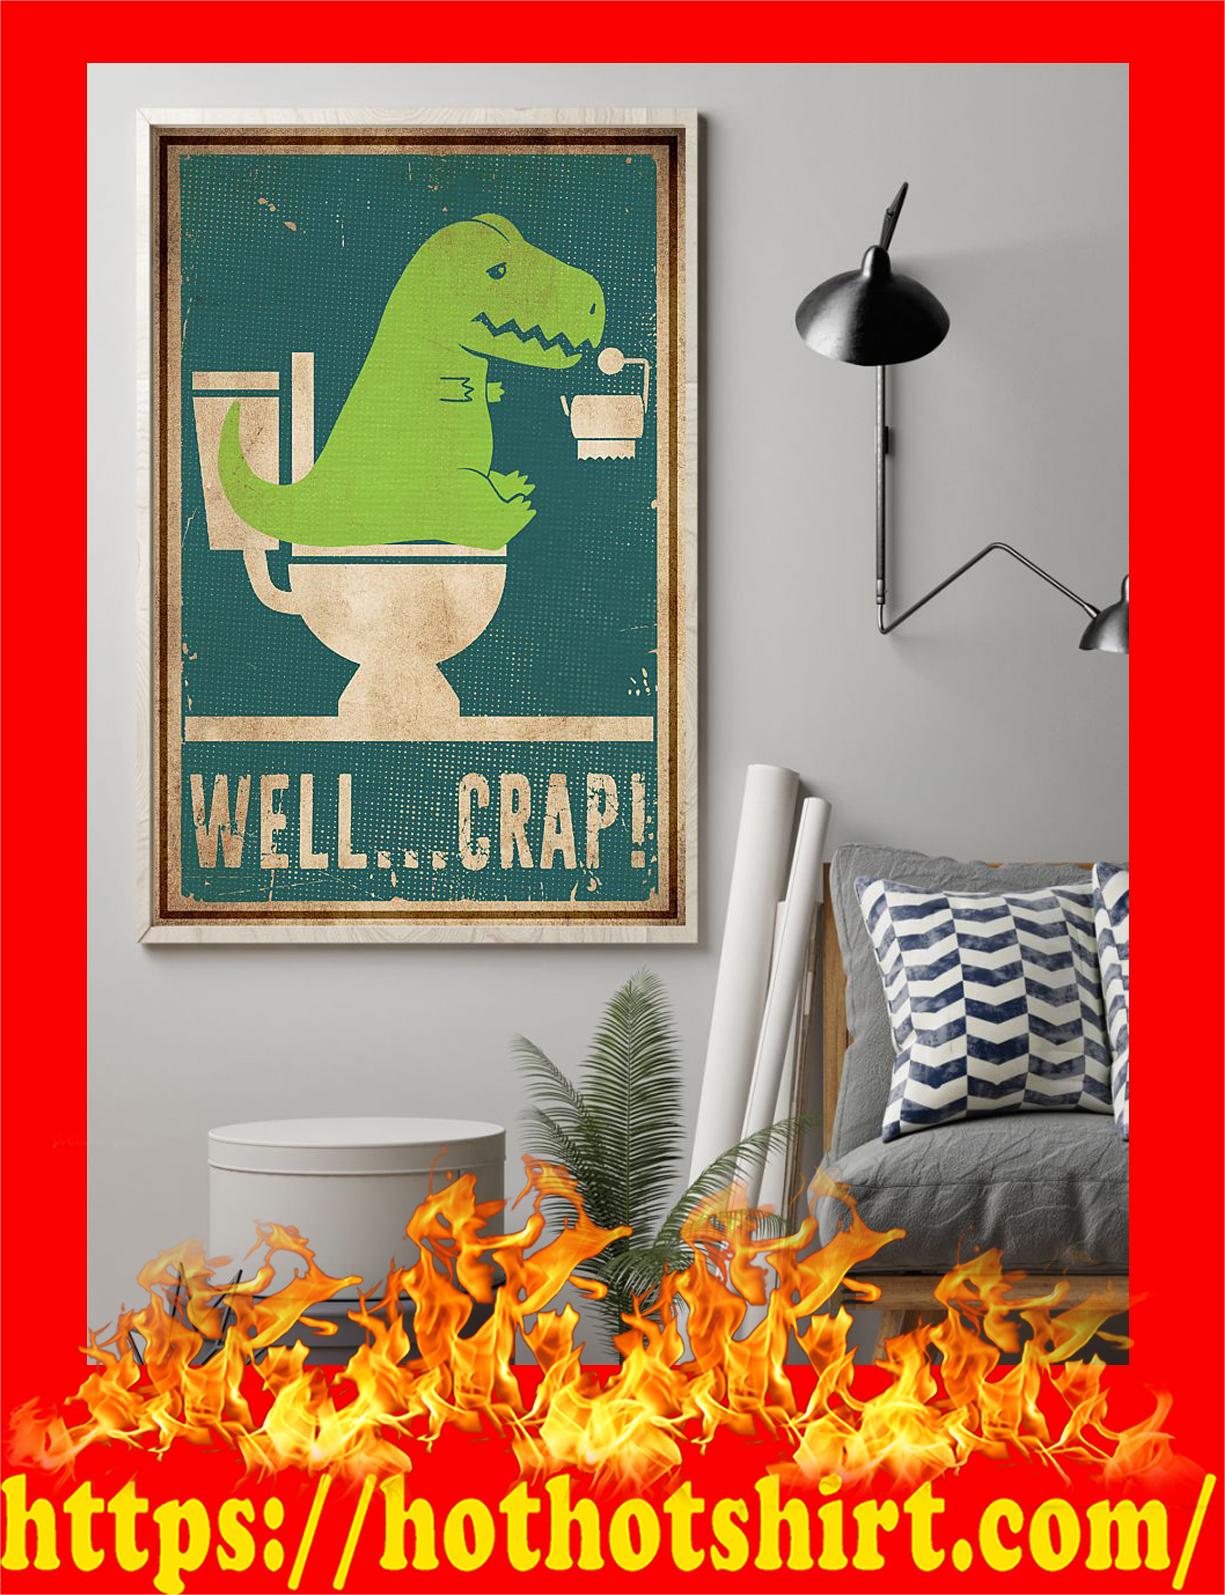 Well crap dinosaur t-rex poster - pic 1